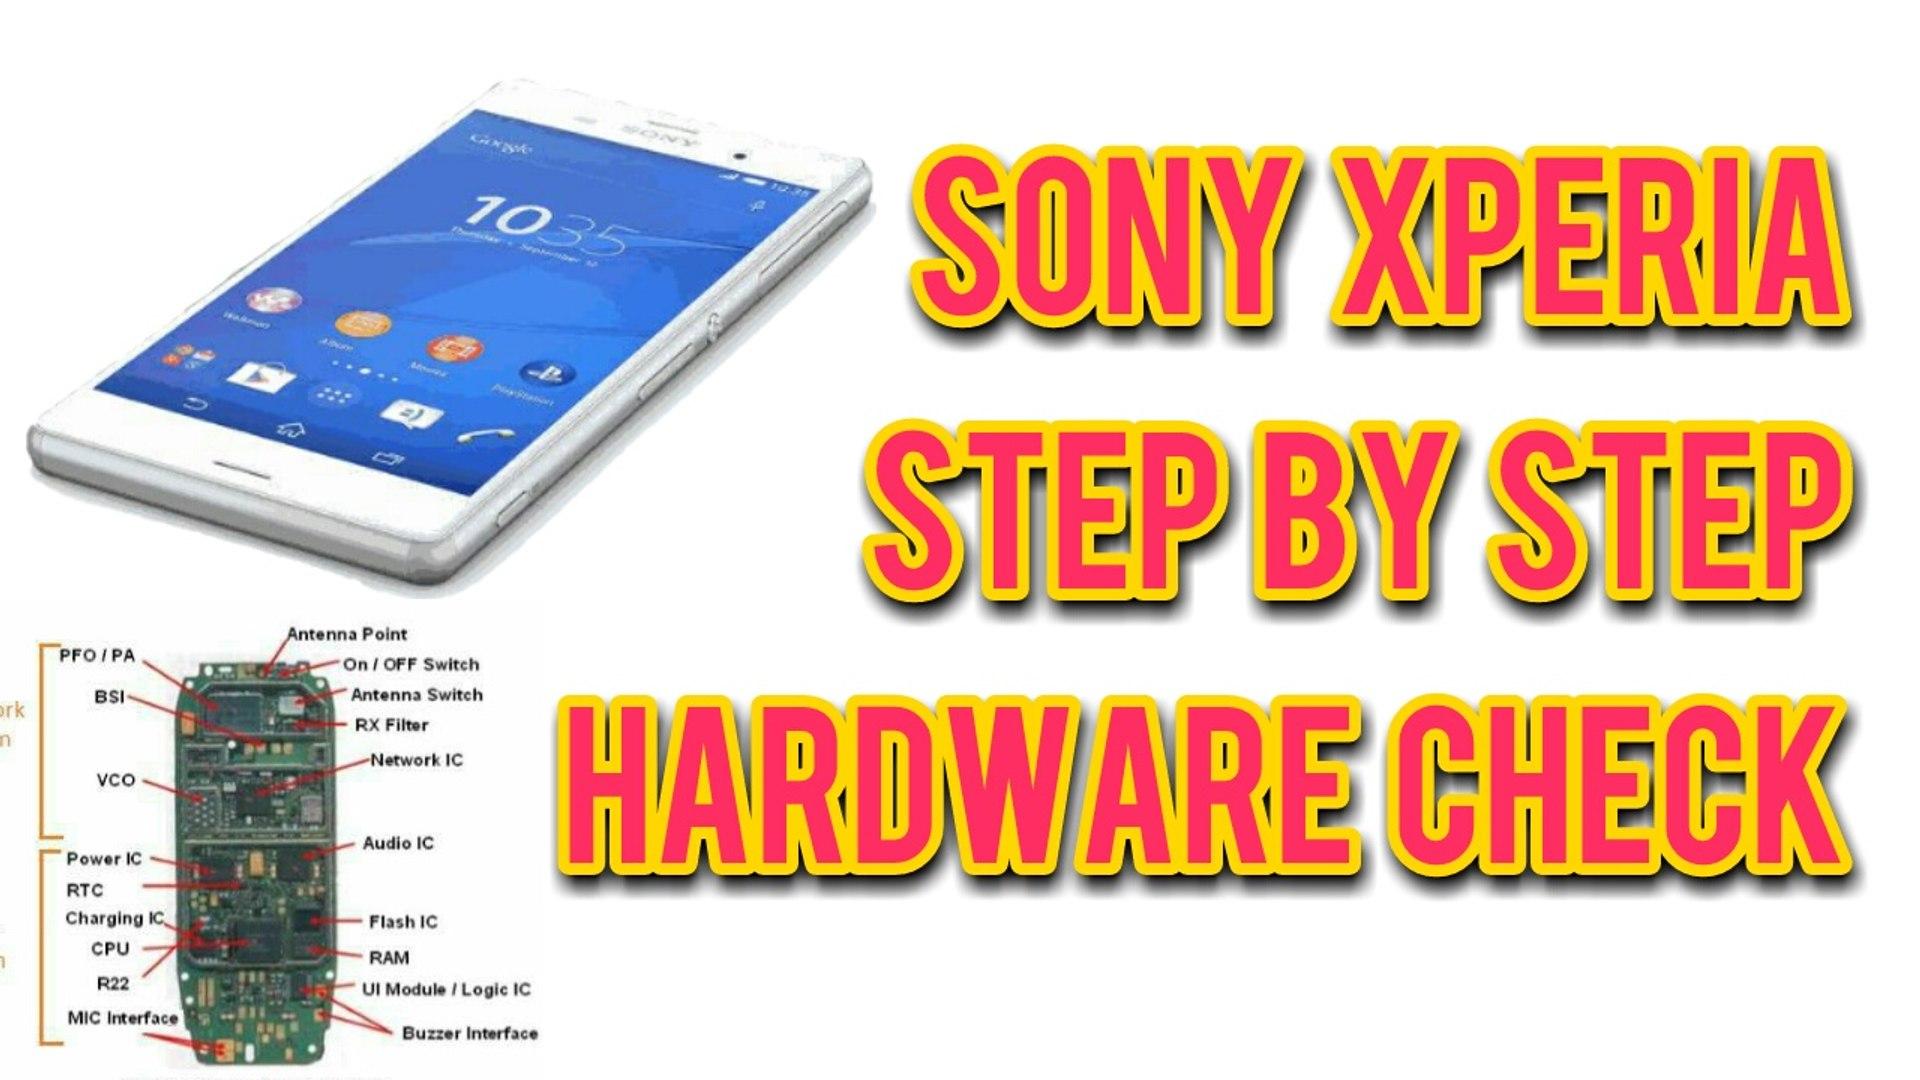 Sony Xperia Phone Hardware Parts Check